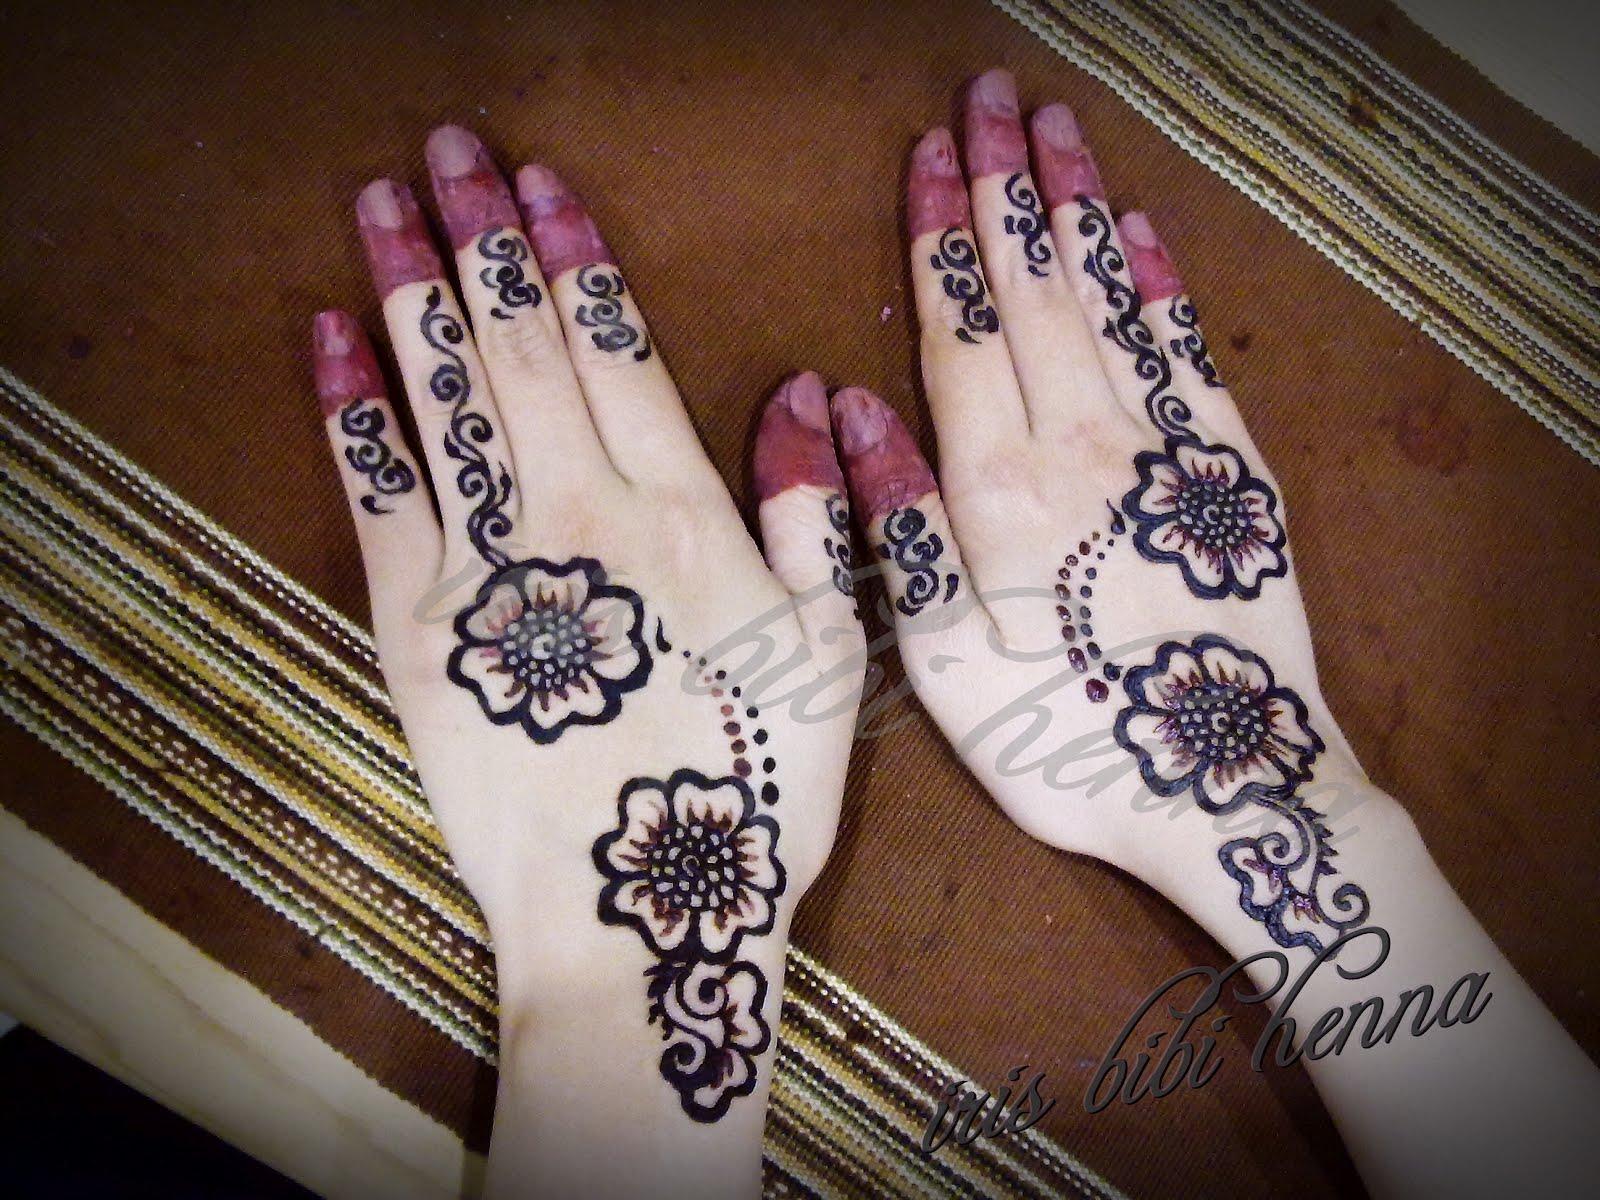 Koleksi Inai Yang Cantik Sayang Dilewatkan Teknik Menggambar Henna